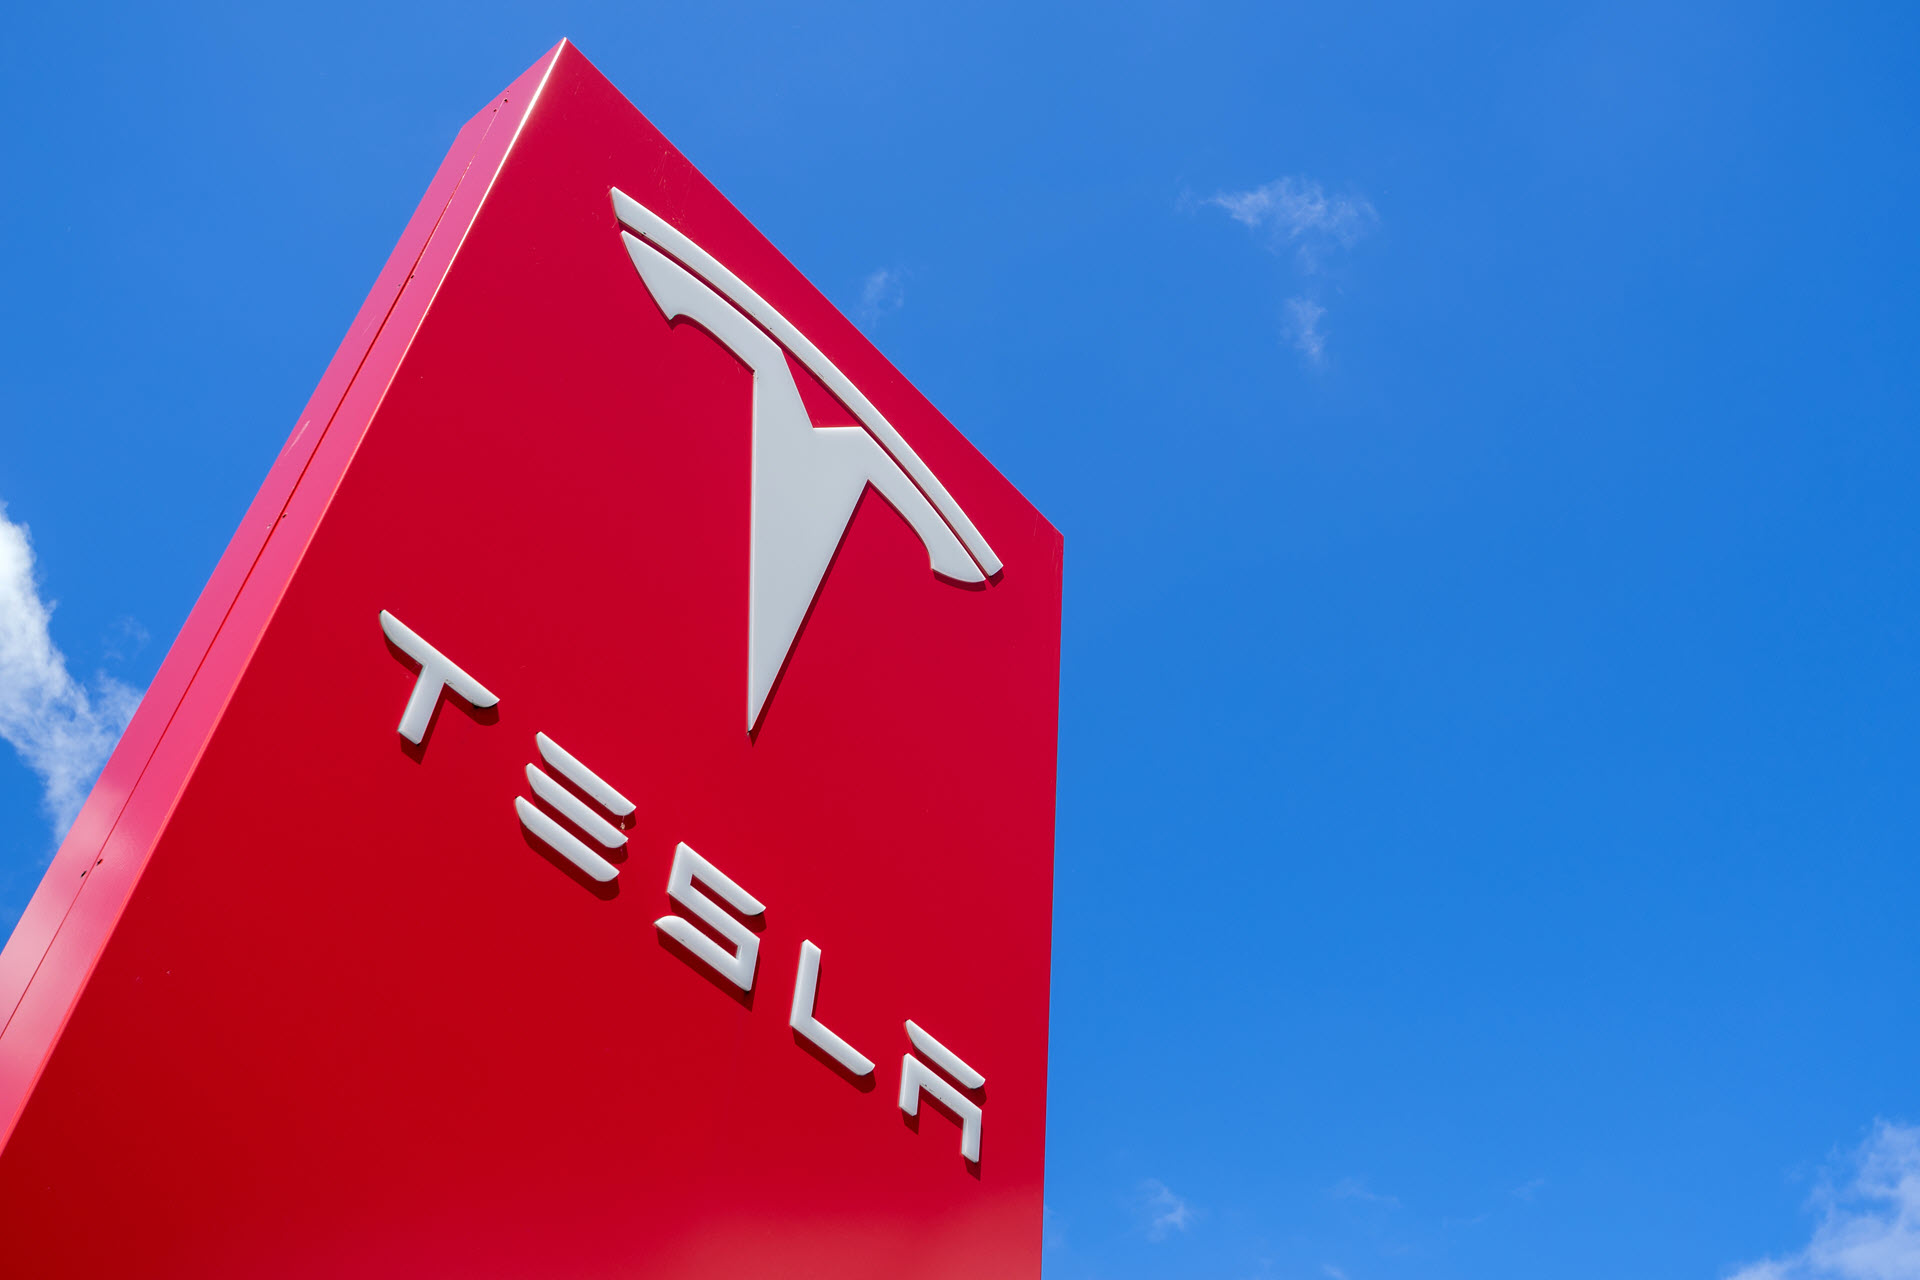 Tesla Battery Day: Musk Could Present Bigger Cells, Dry Electrodes